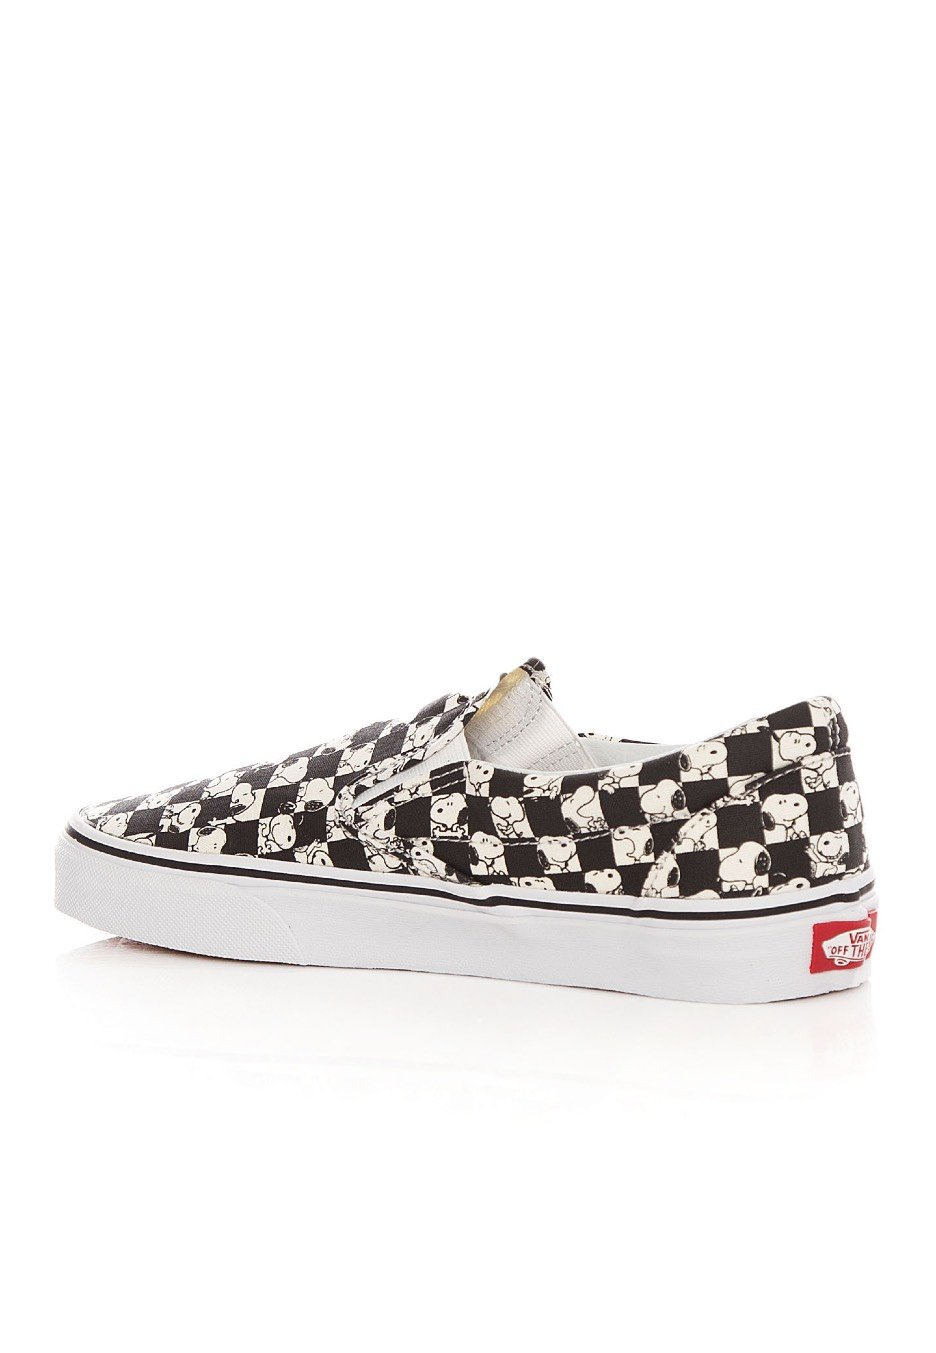 Vans X Peanuts - Classic Slip-On Peanuts Snoopy/Checkerboard ...